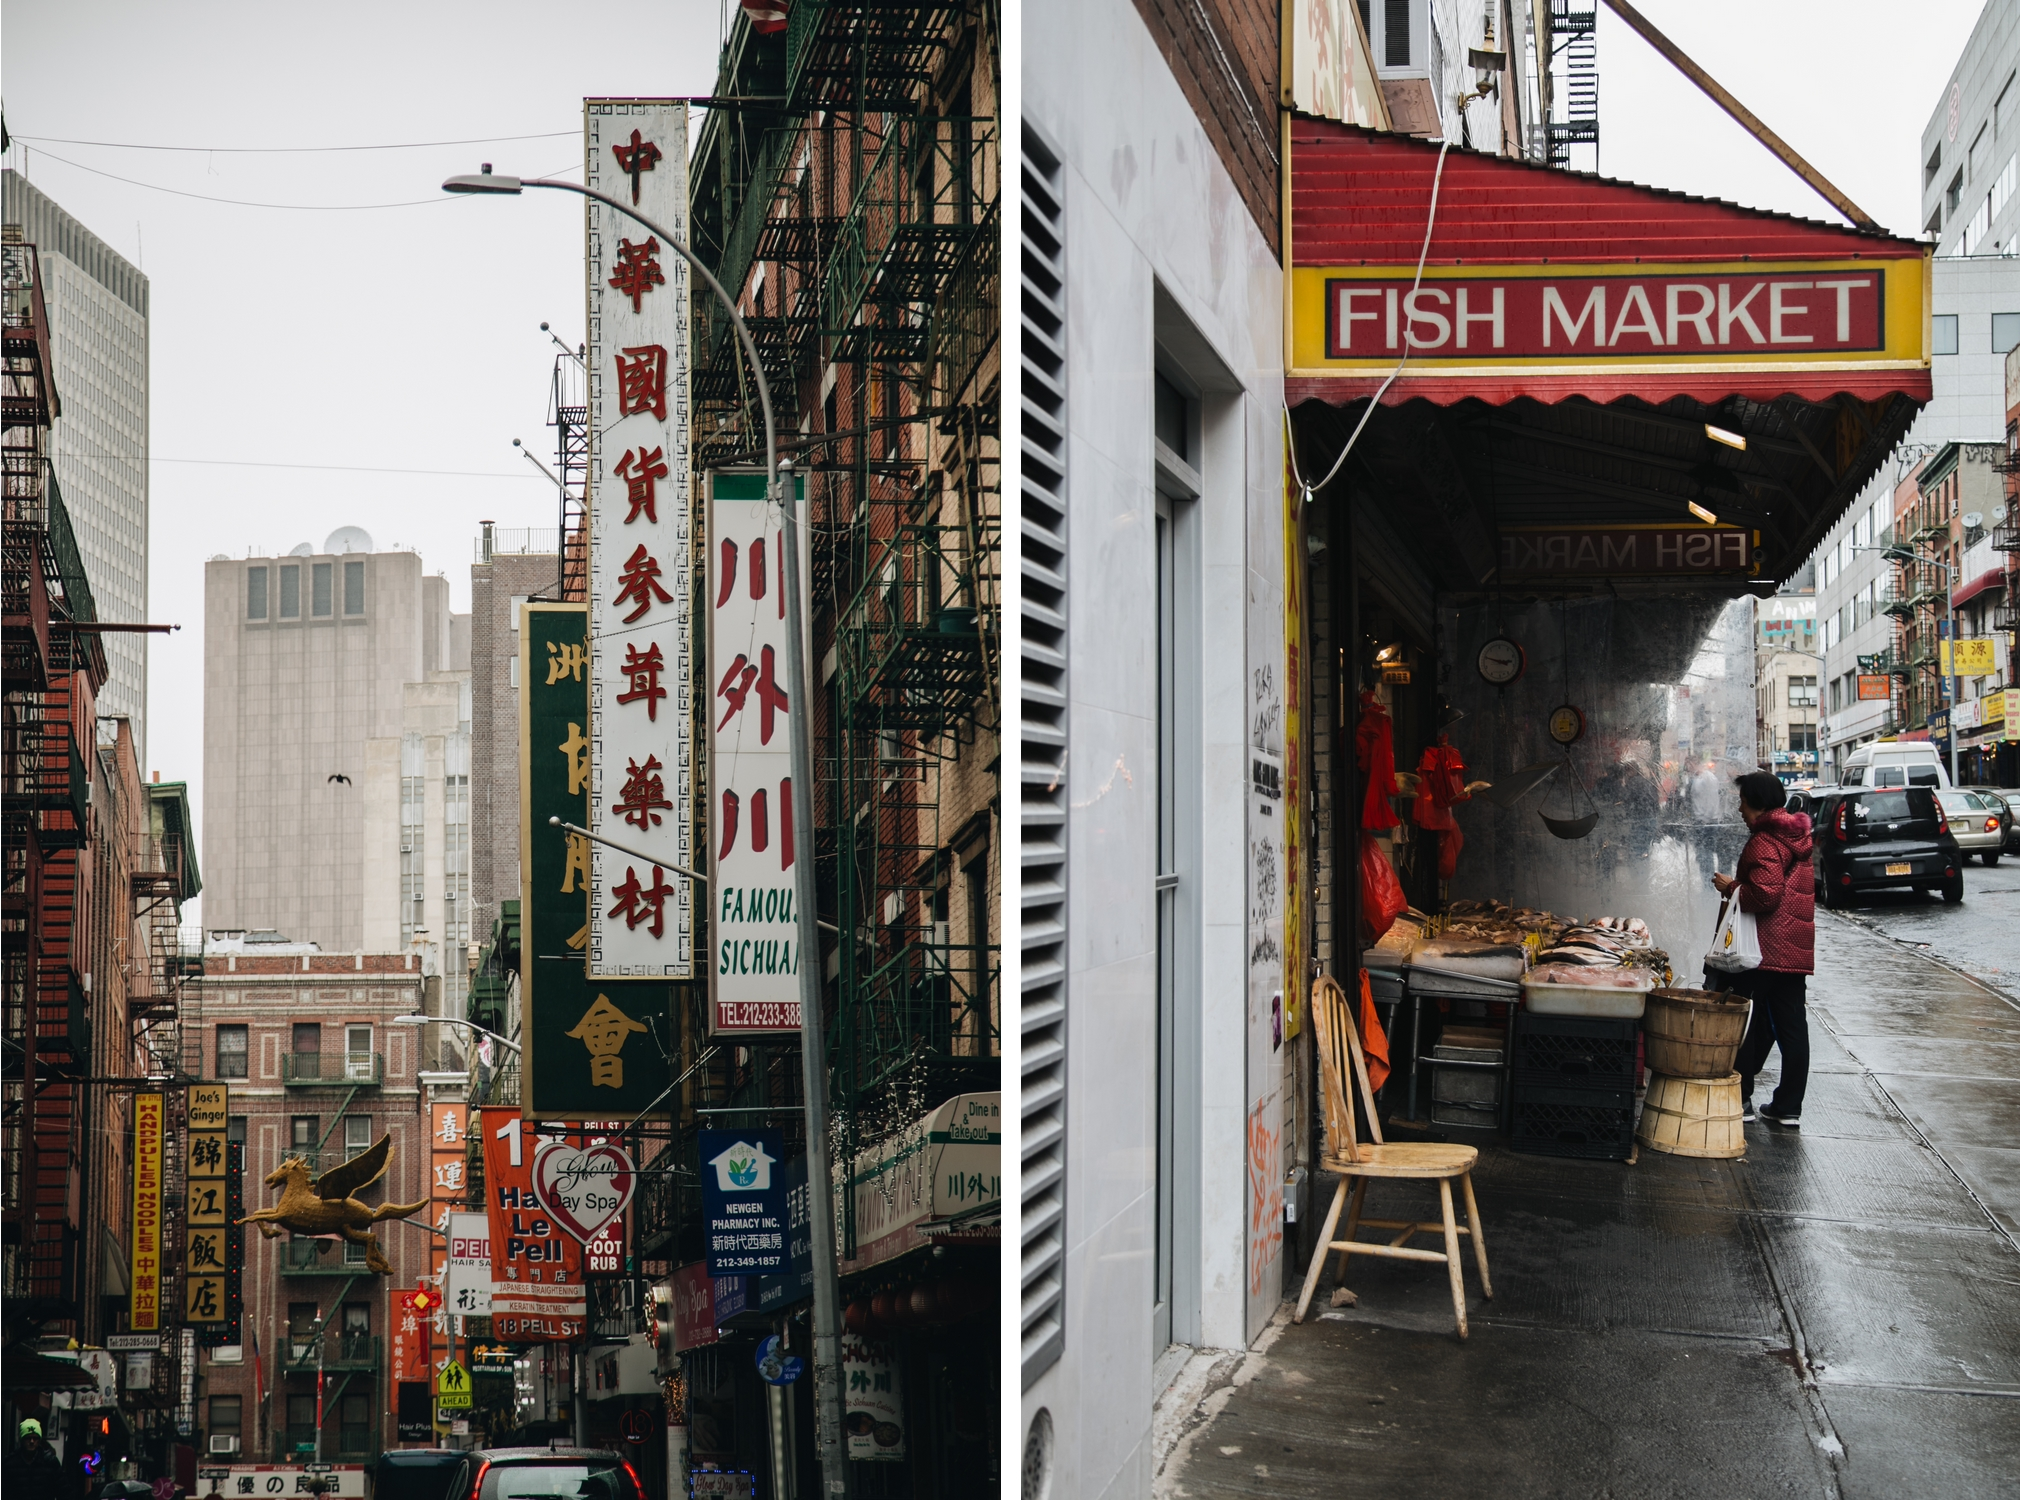 chinatown-visiteguidee-blog-voyage-newyork4.jpg